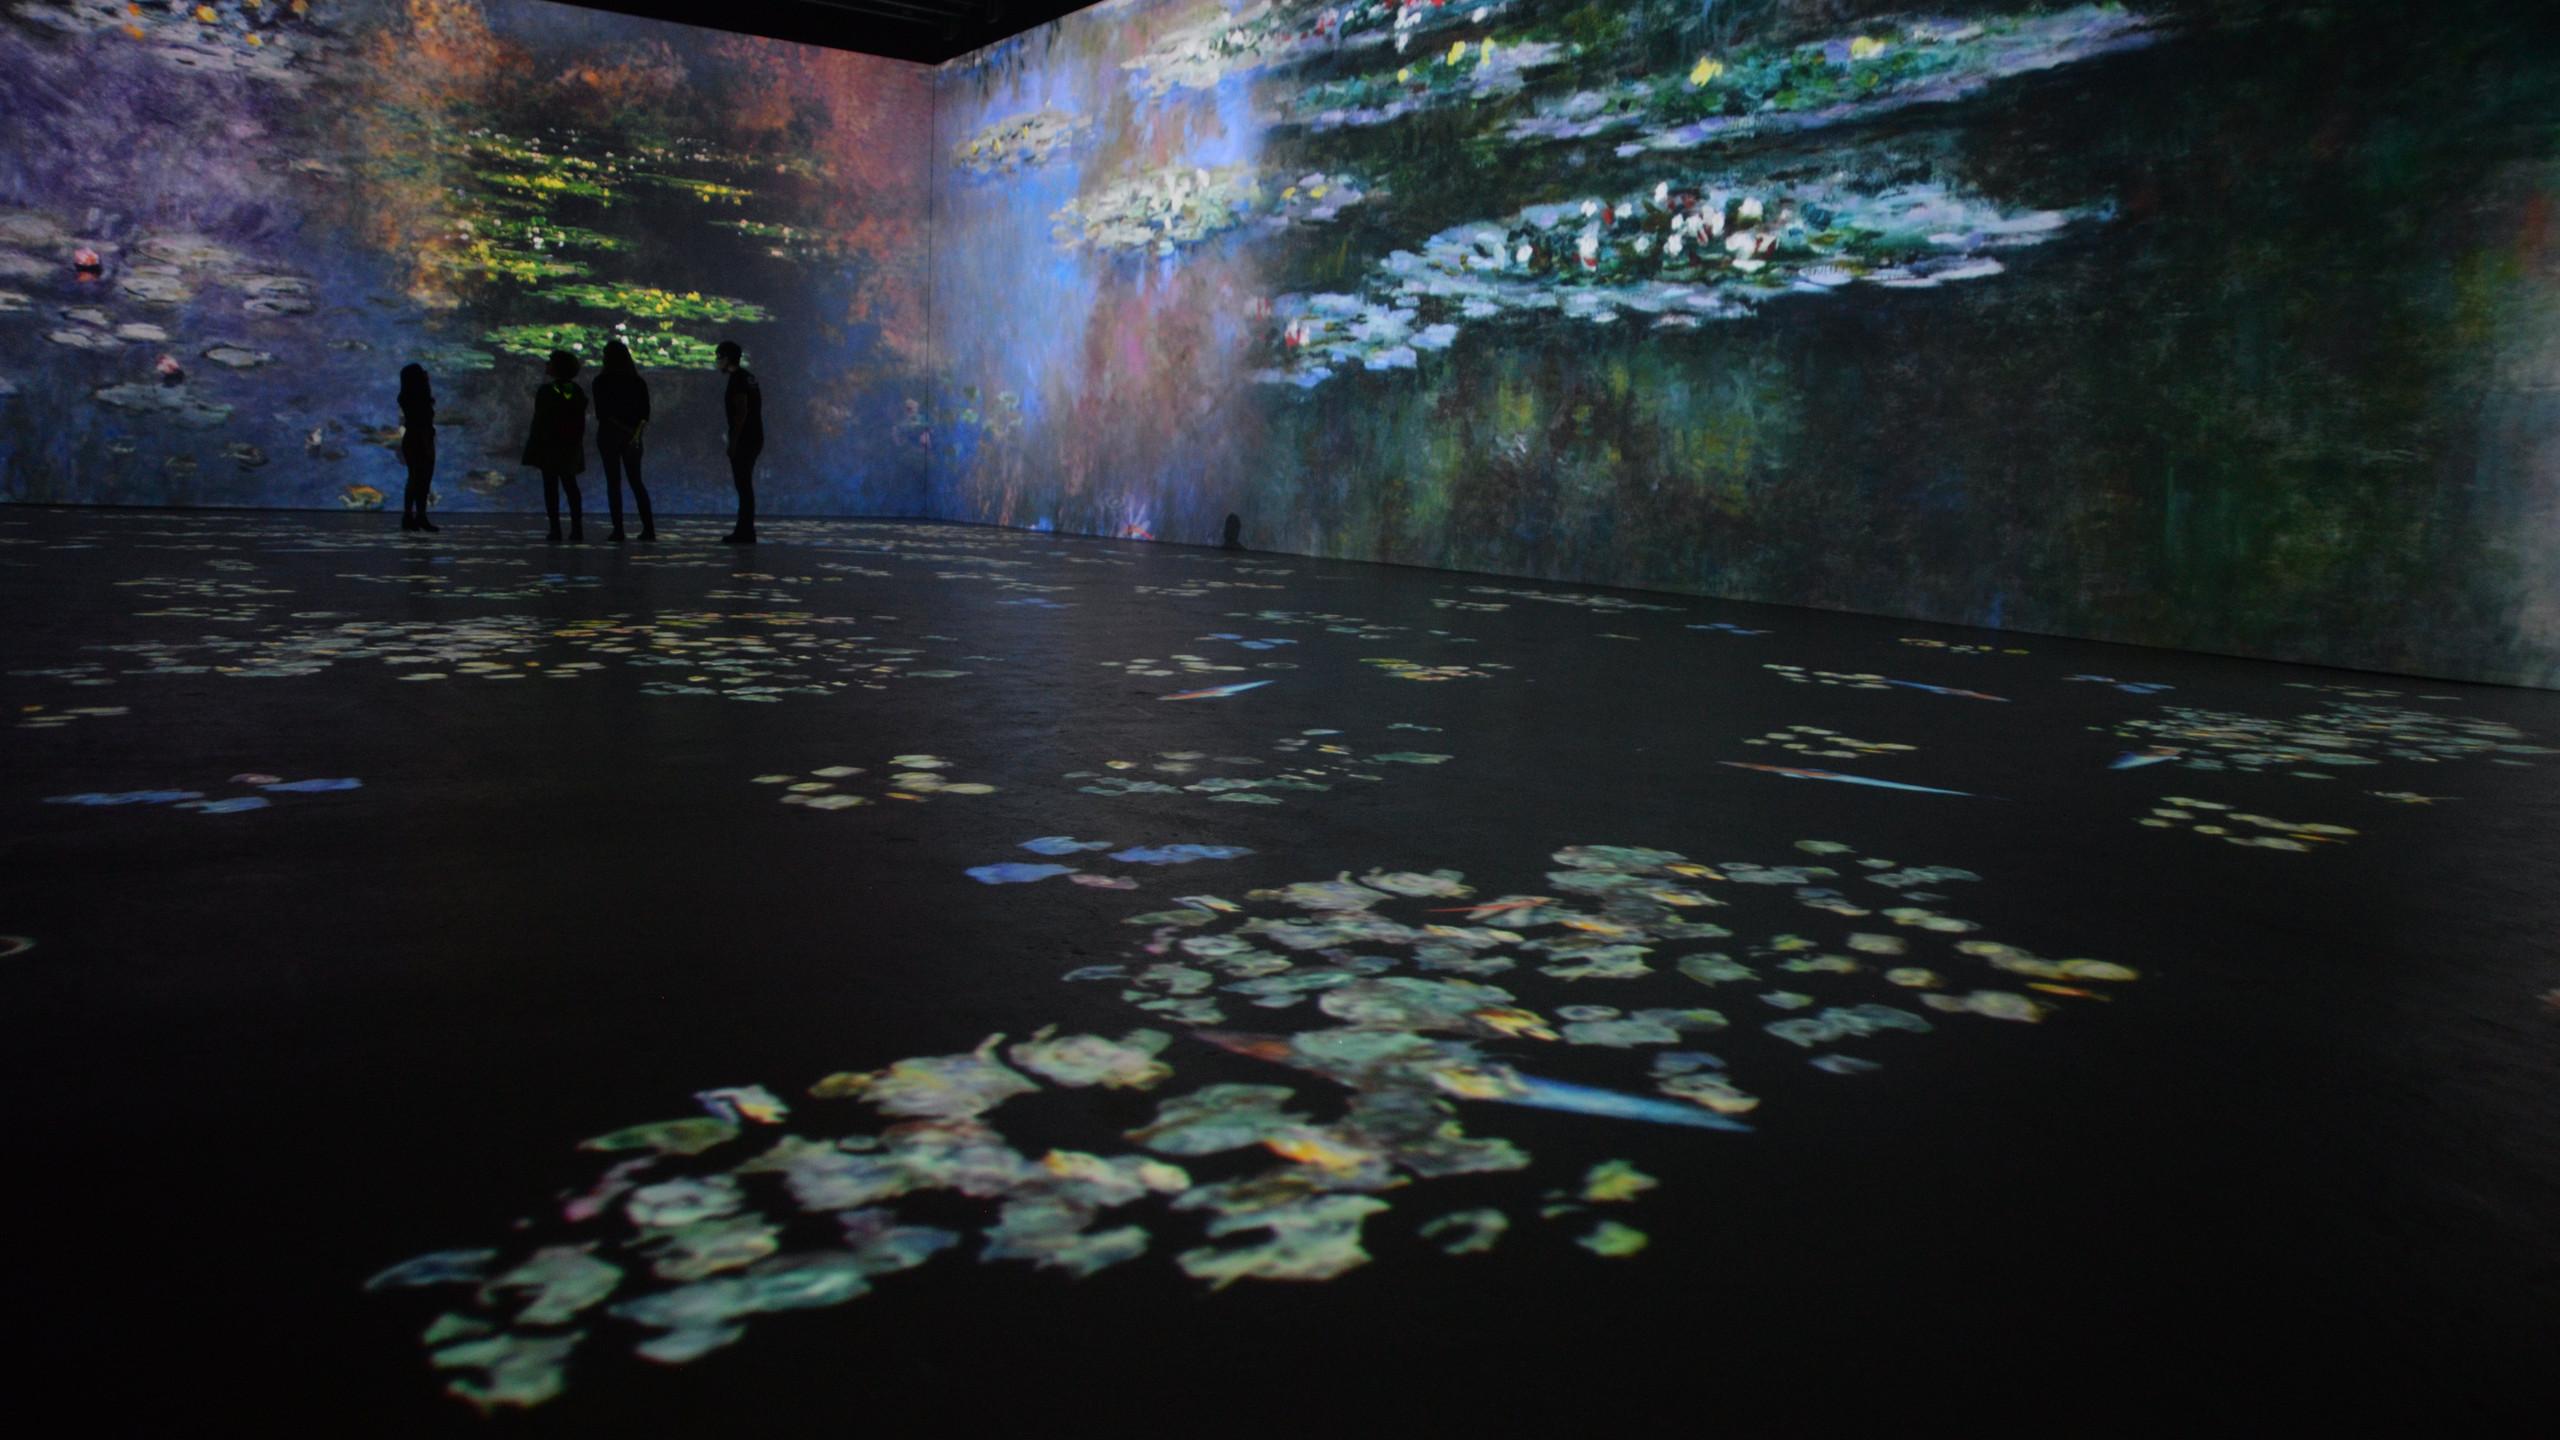 Ideal_Monet_immersive-Arte12b